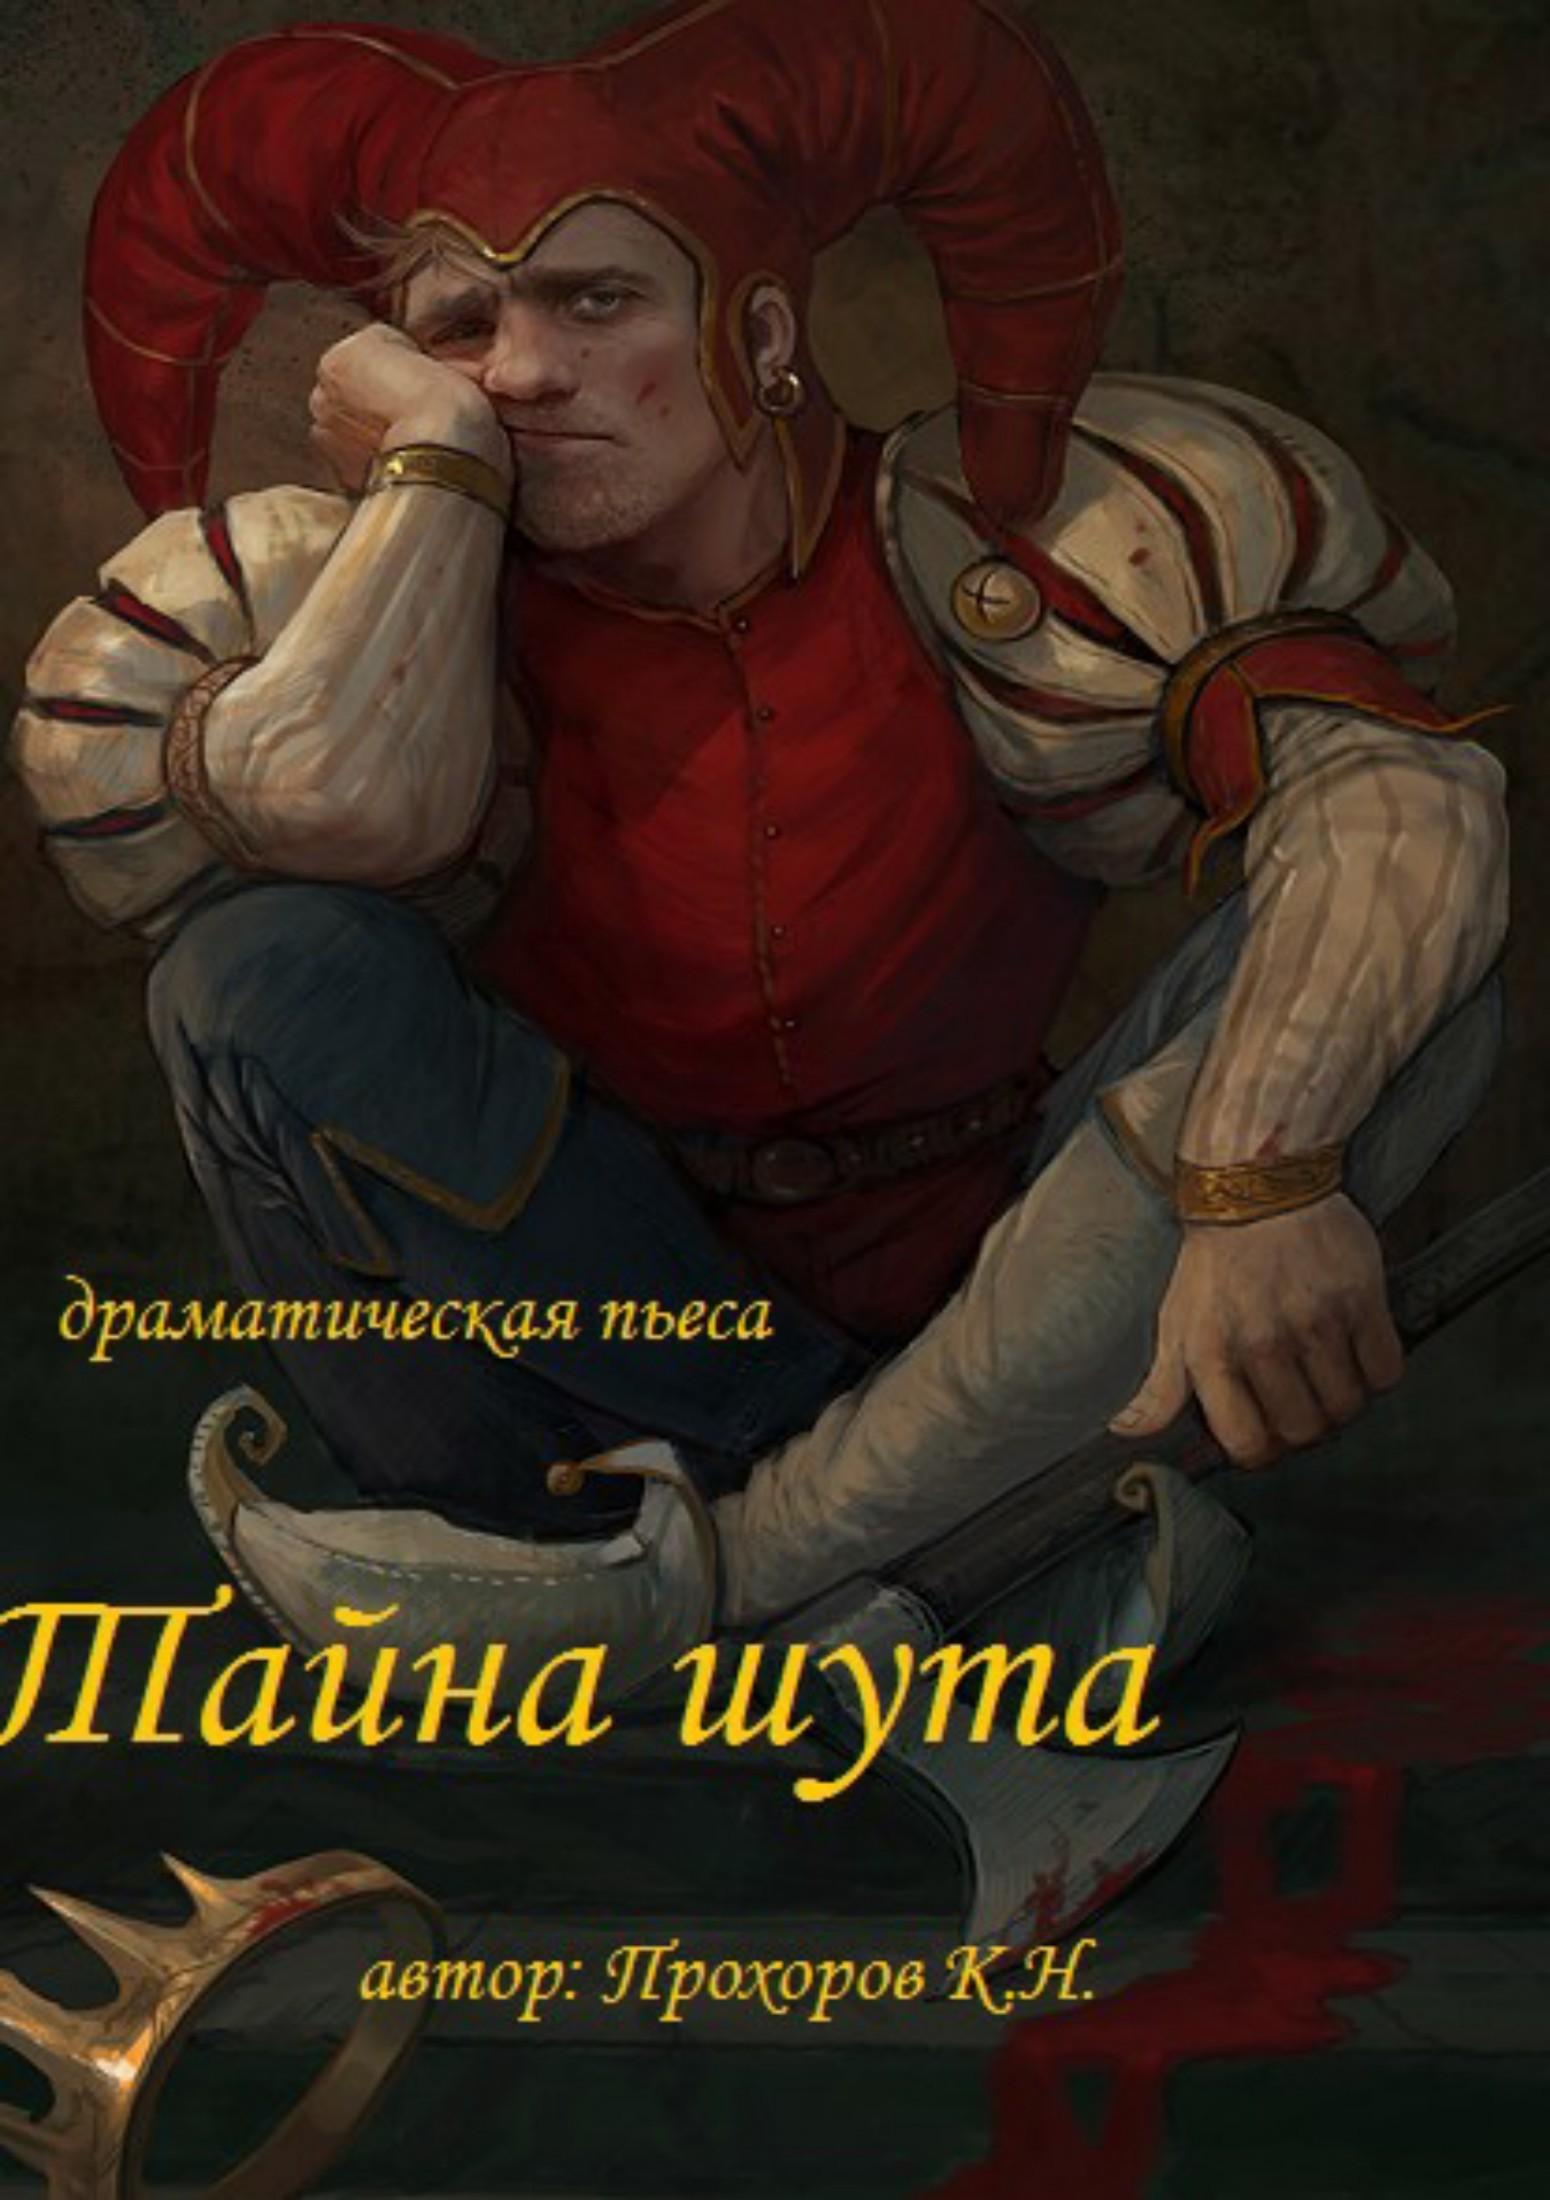 Константин Прохоров - Тайна шута